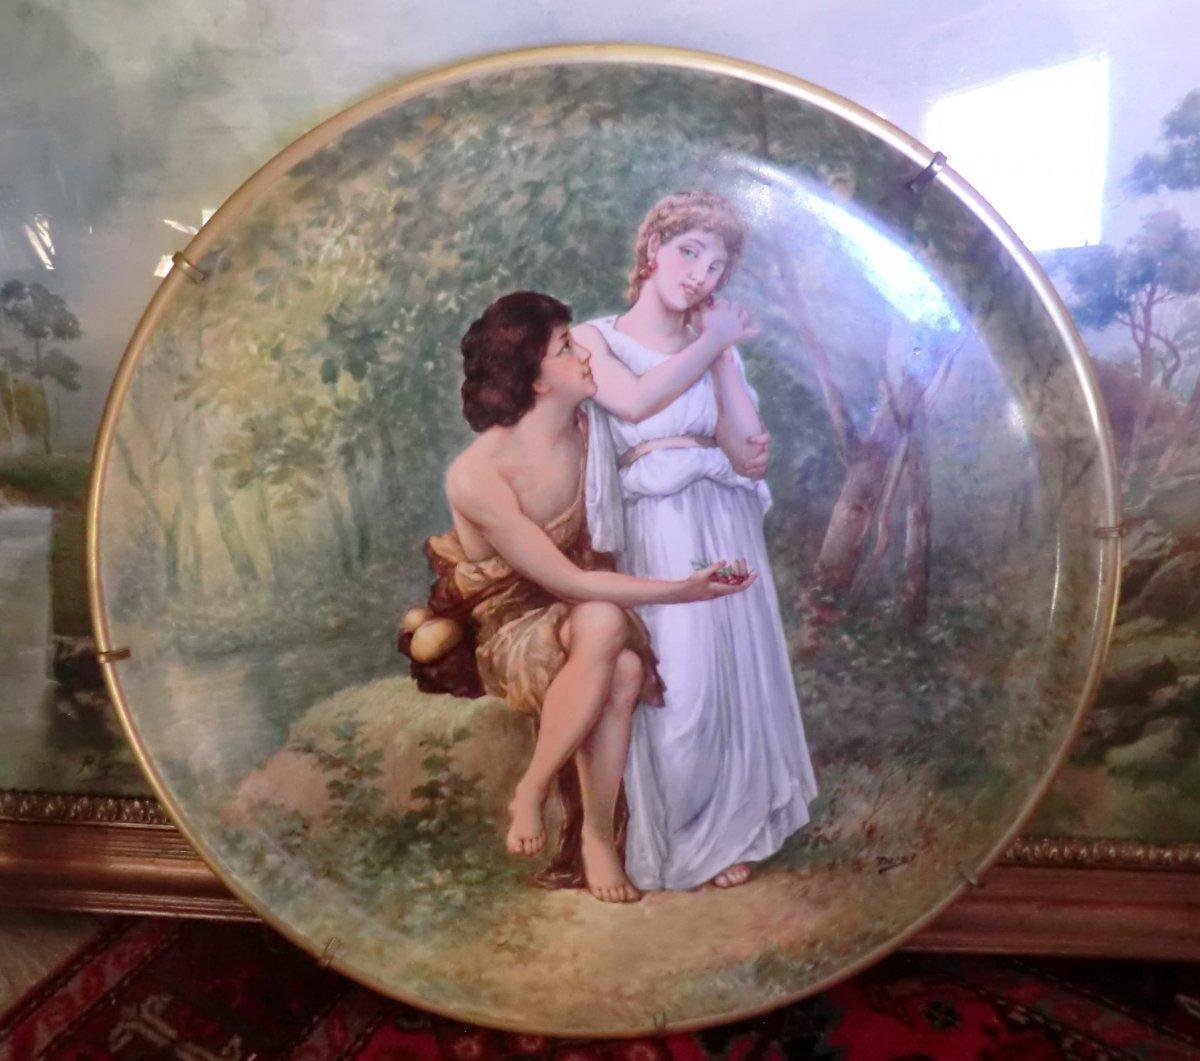 Important Polychrome Porcelain Dish Enameled From Limoges Signed Dubois